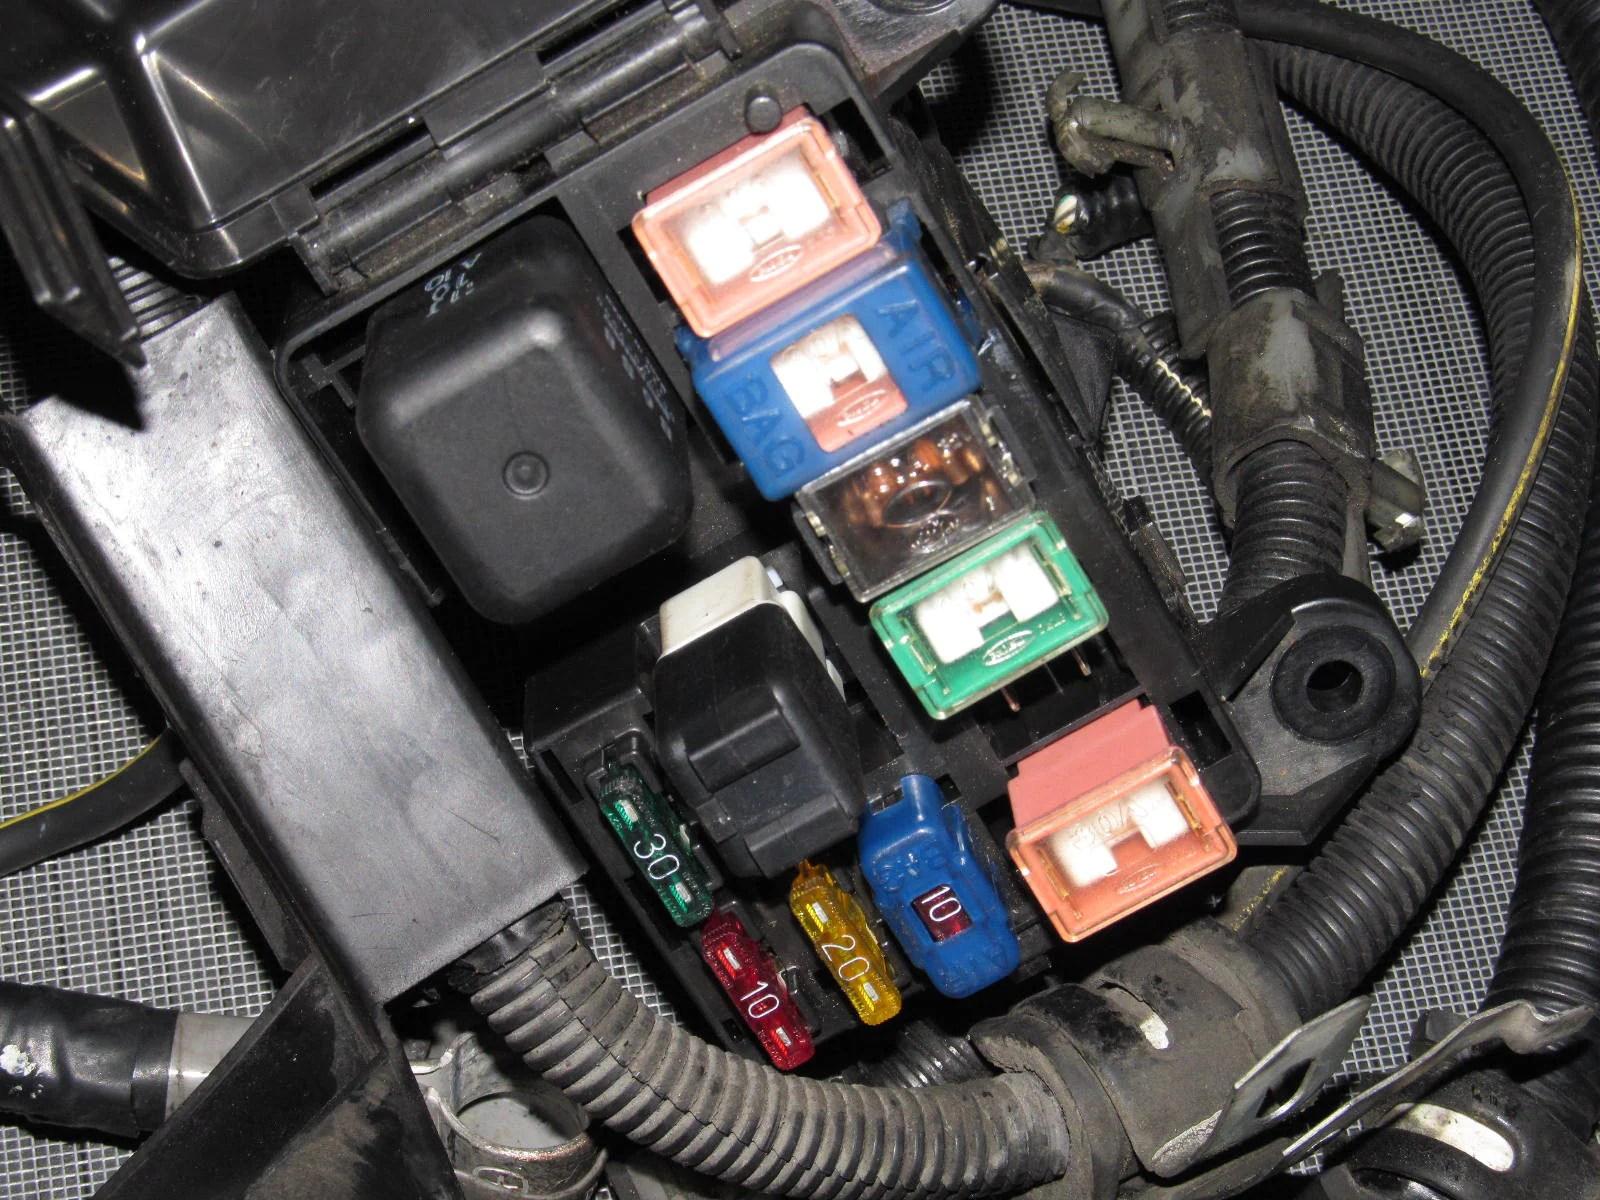 90 91 92 93 mazda miata fuse box transmission engine wiring rh autopartone com on [ 1600 x 1200 Pixel ]